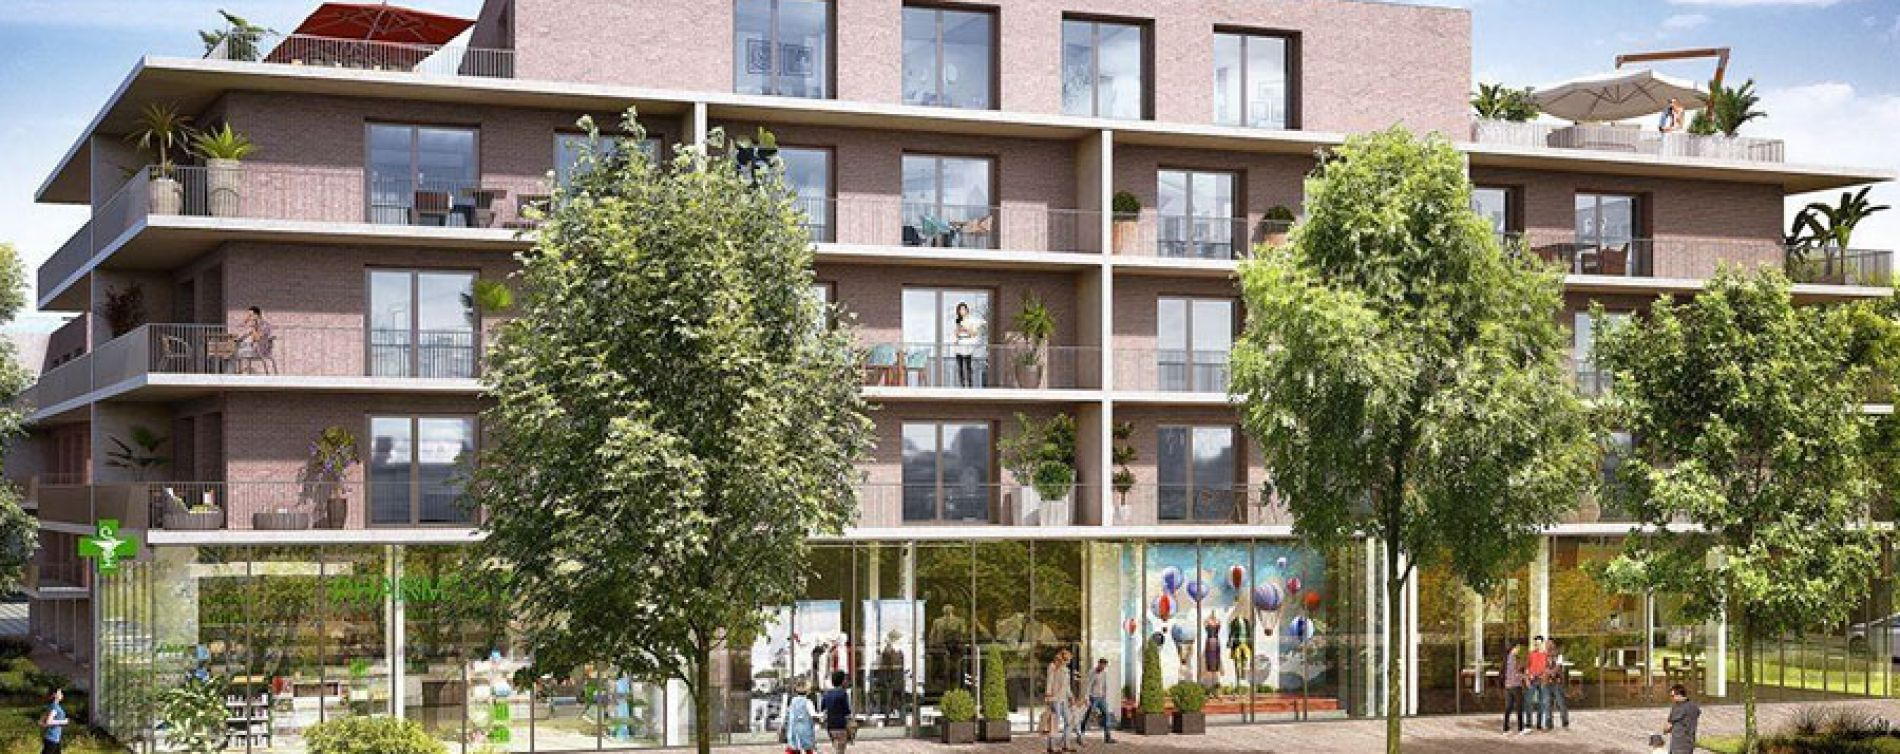 Résidence Les Terrasses de l'Esplanade à Amiens